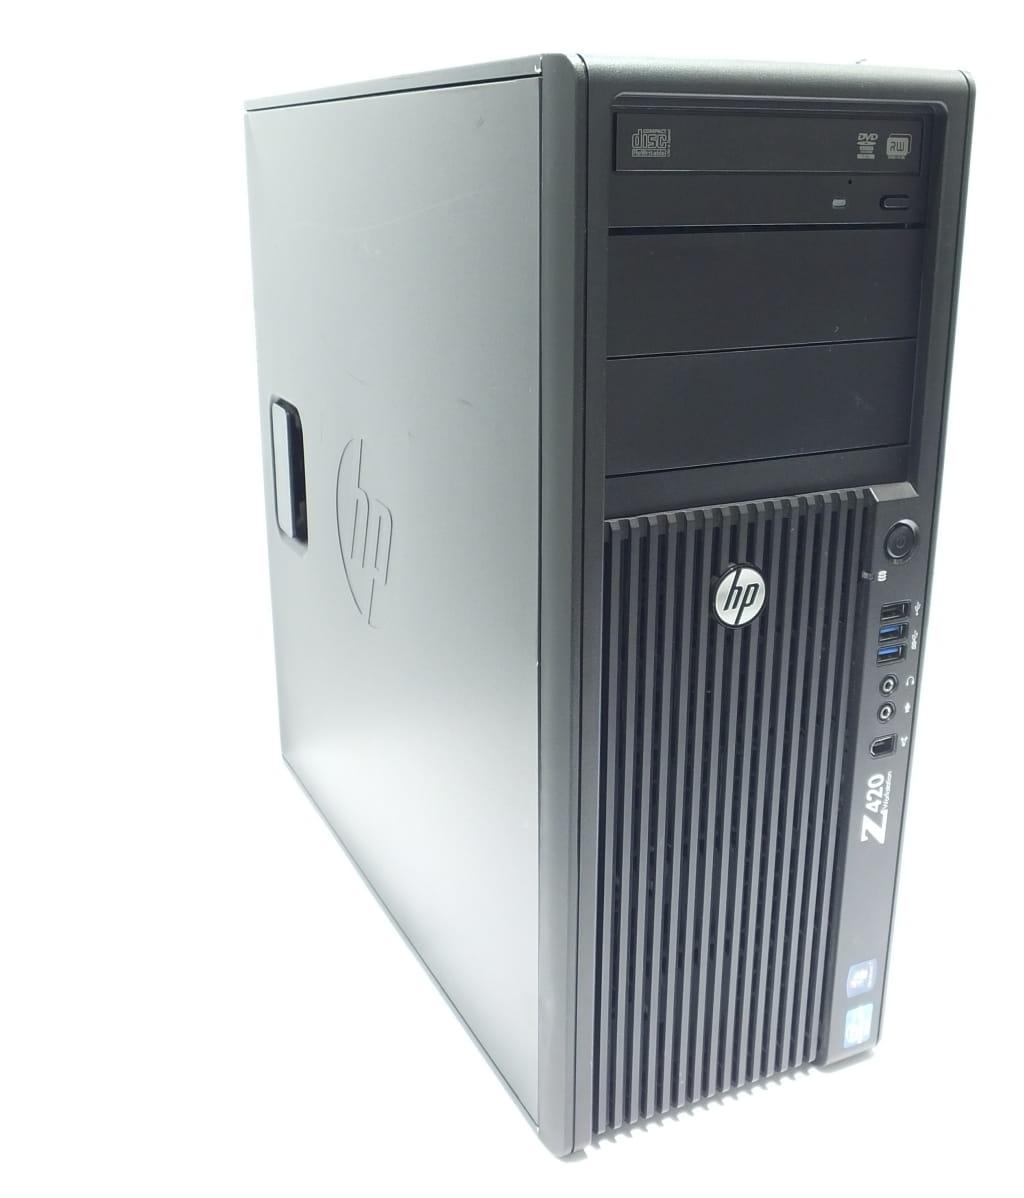 Komputer HP Z420 Xeon E5-1603 2,8 GHz 32GB 250GB Windows 10 Home